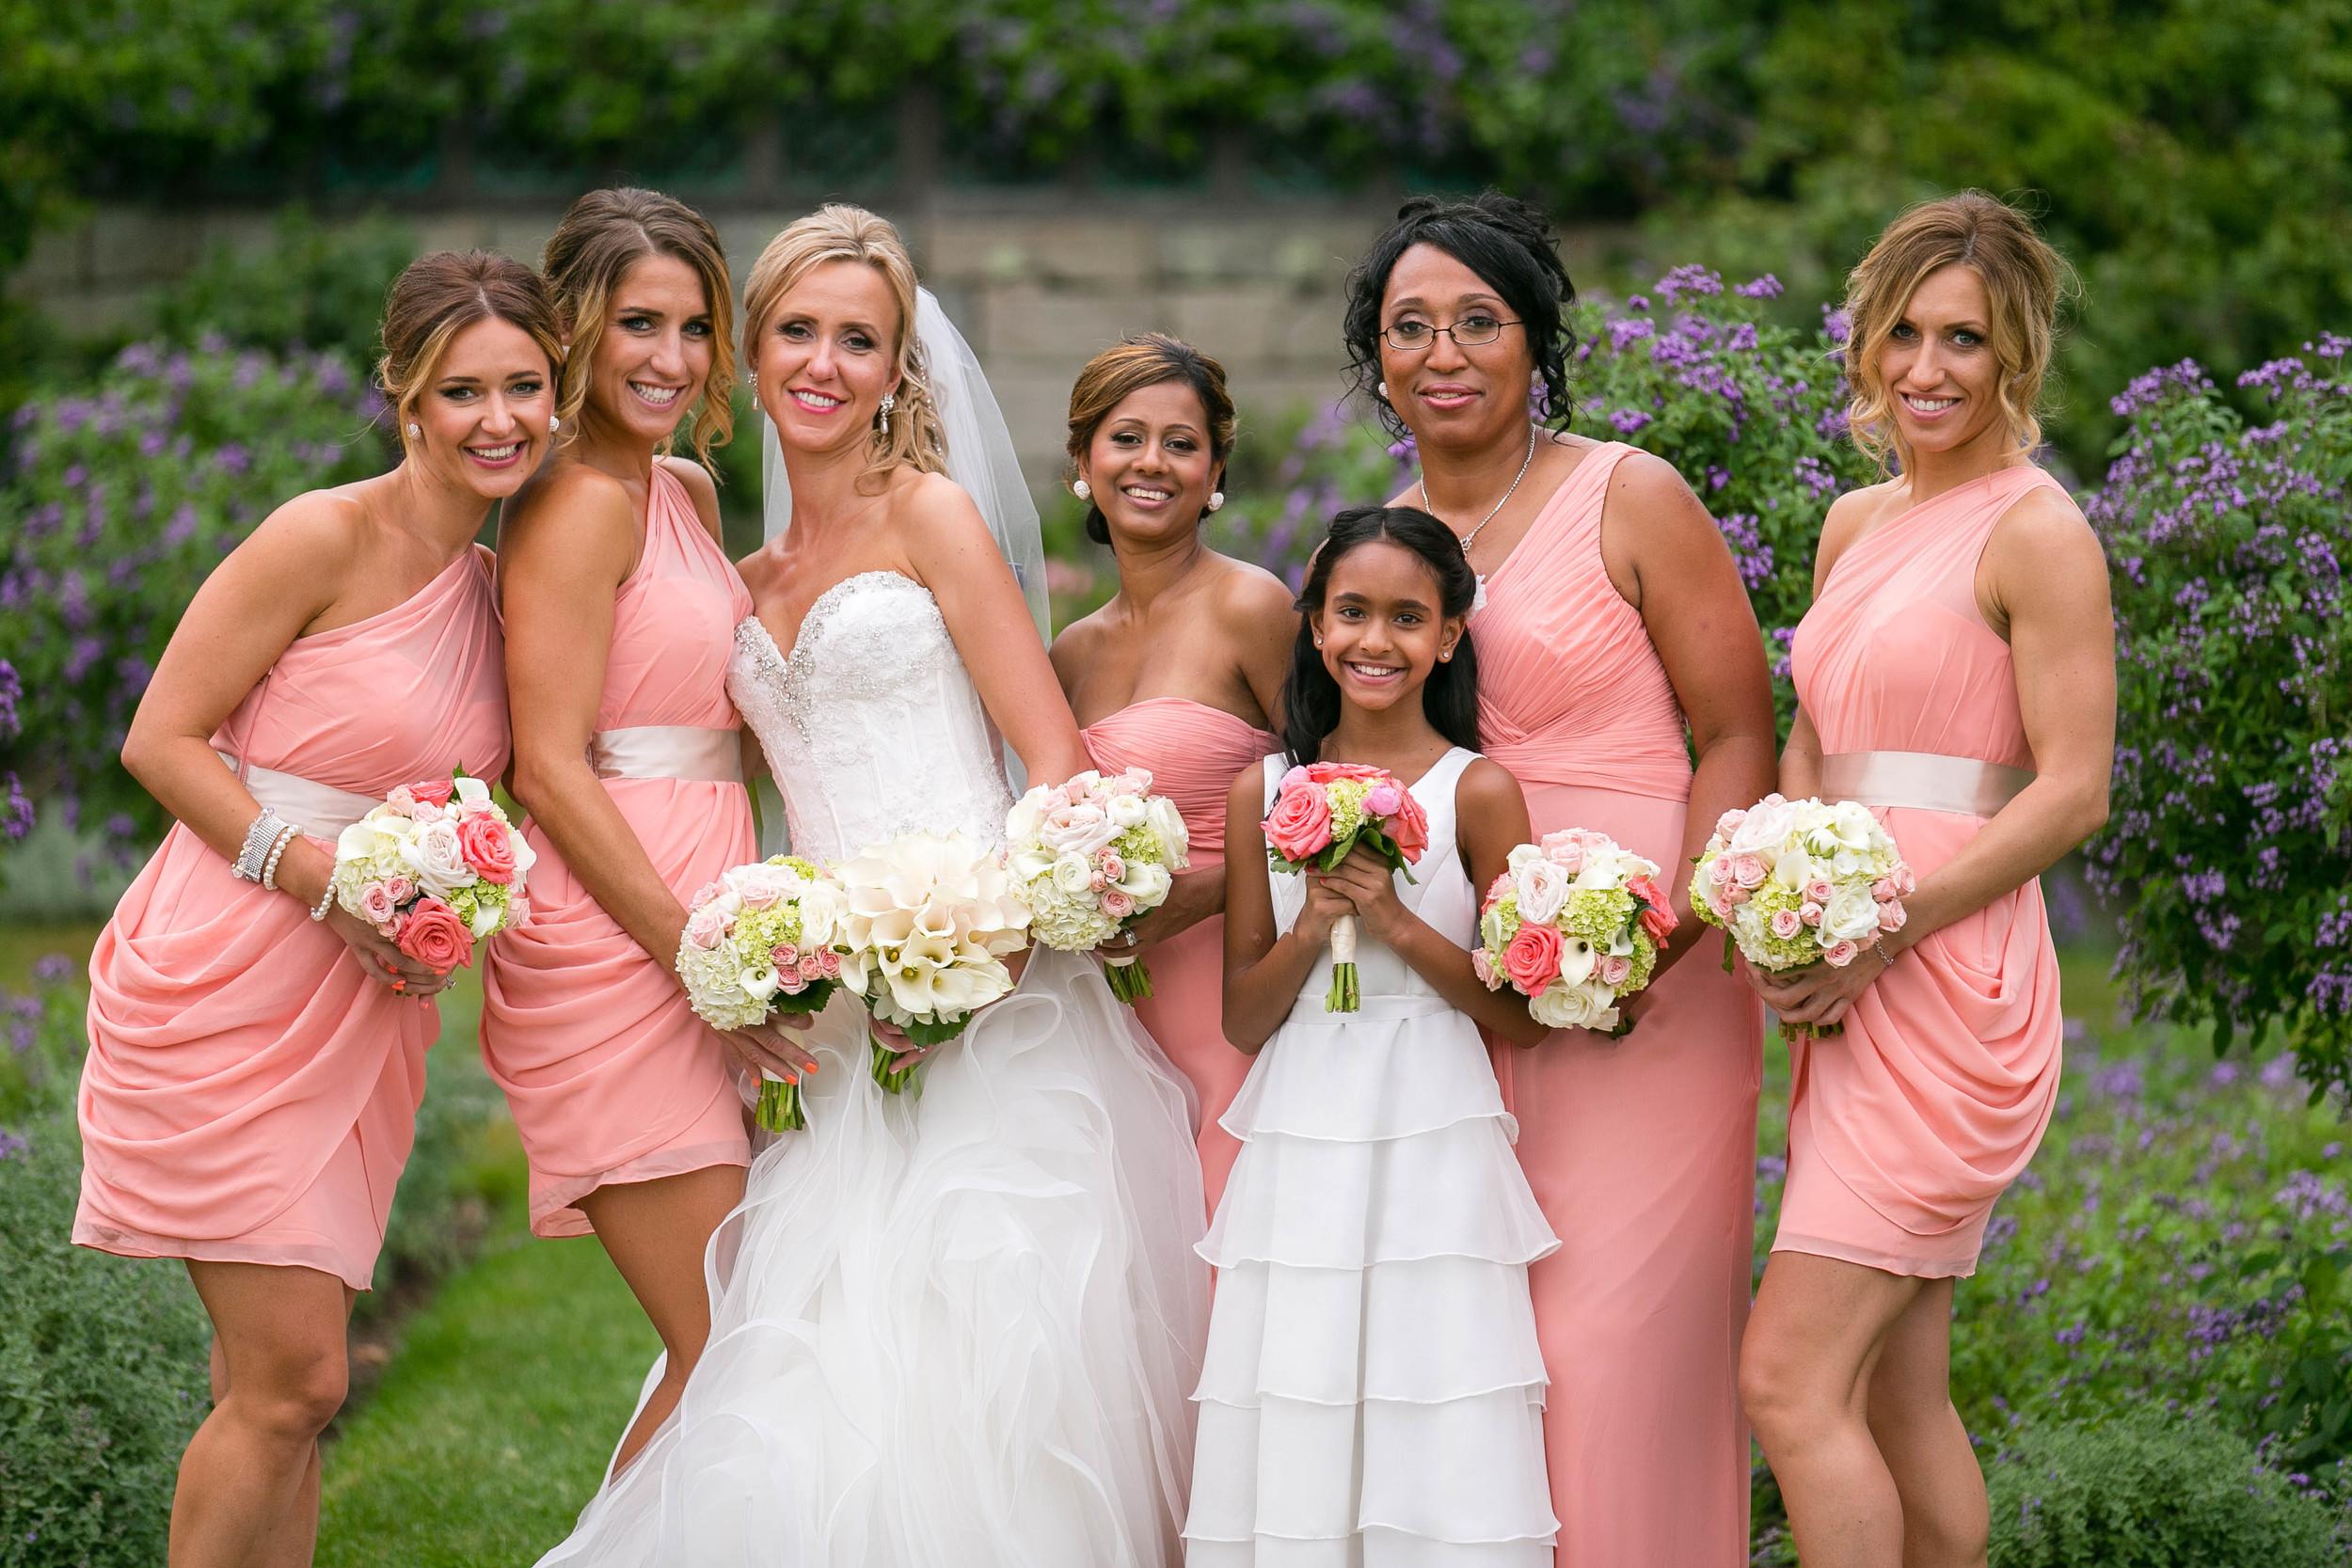 Elegant-American-Wedding-Harkness-Mystic-CT-Documentary-Wedding-Photographer-Jacek-Dolata-12.jpg